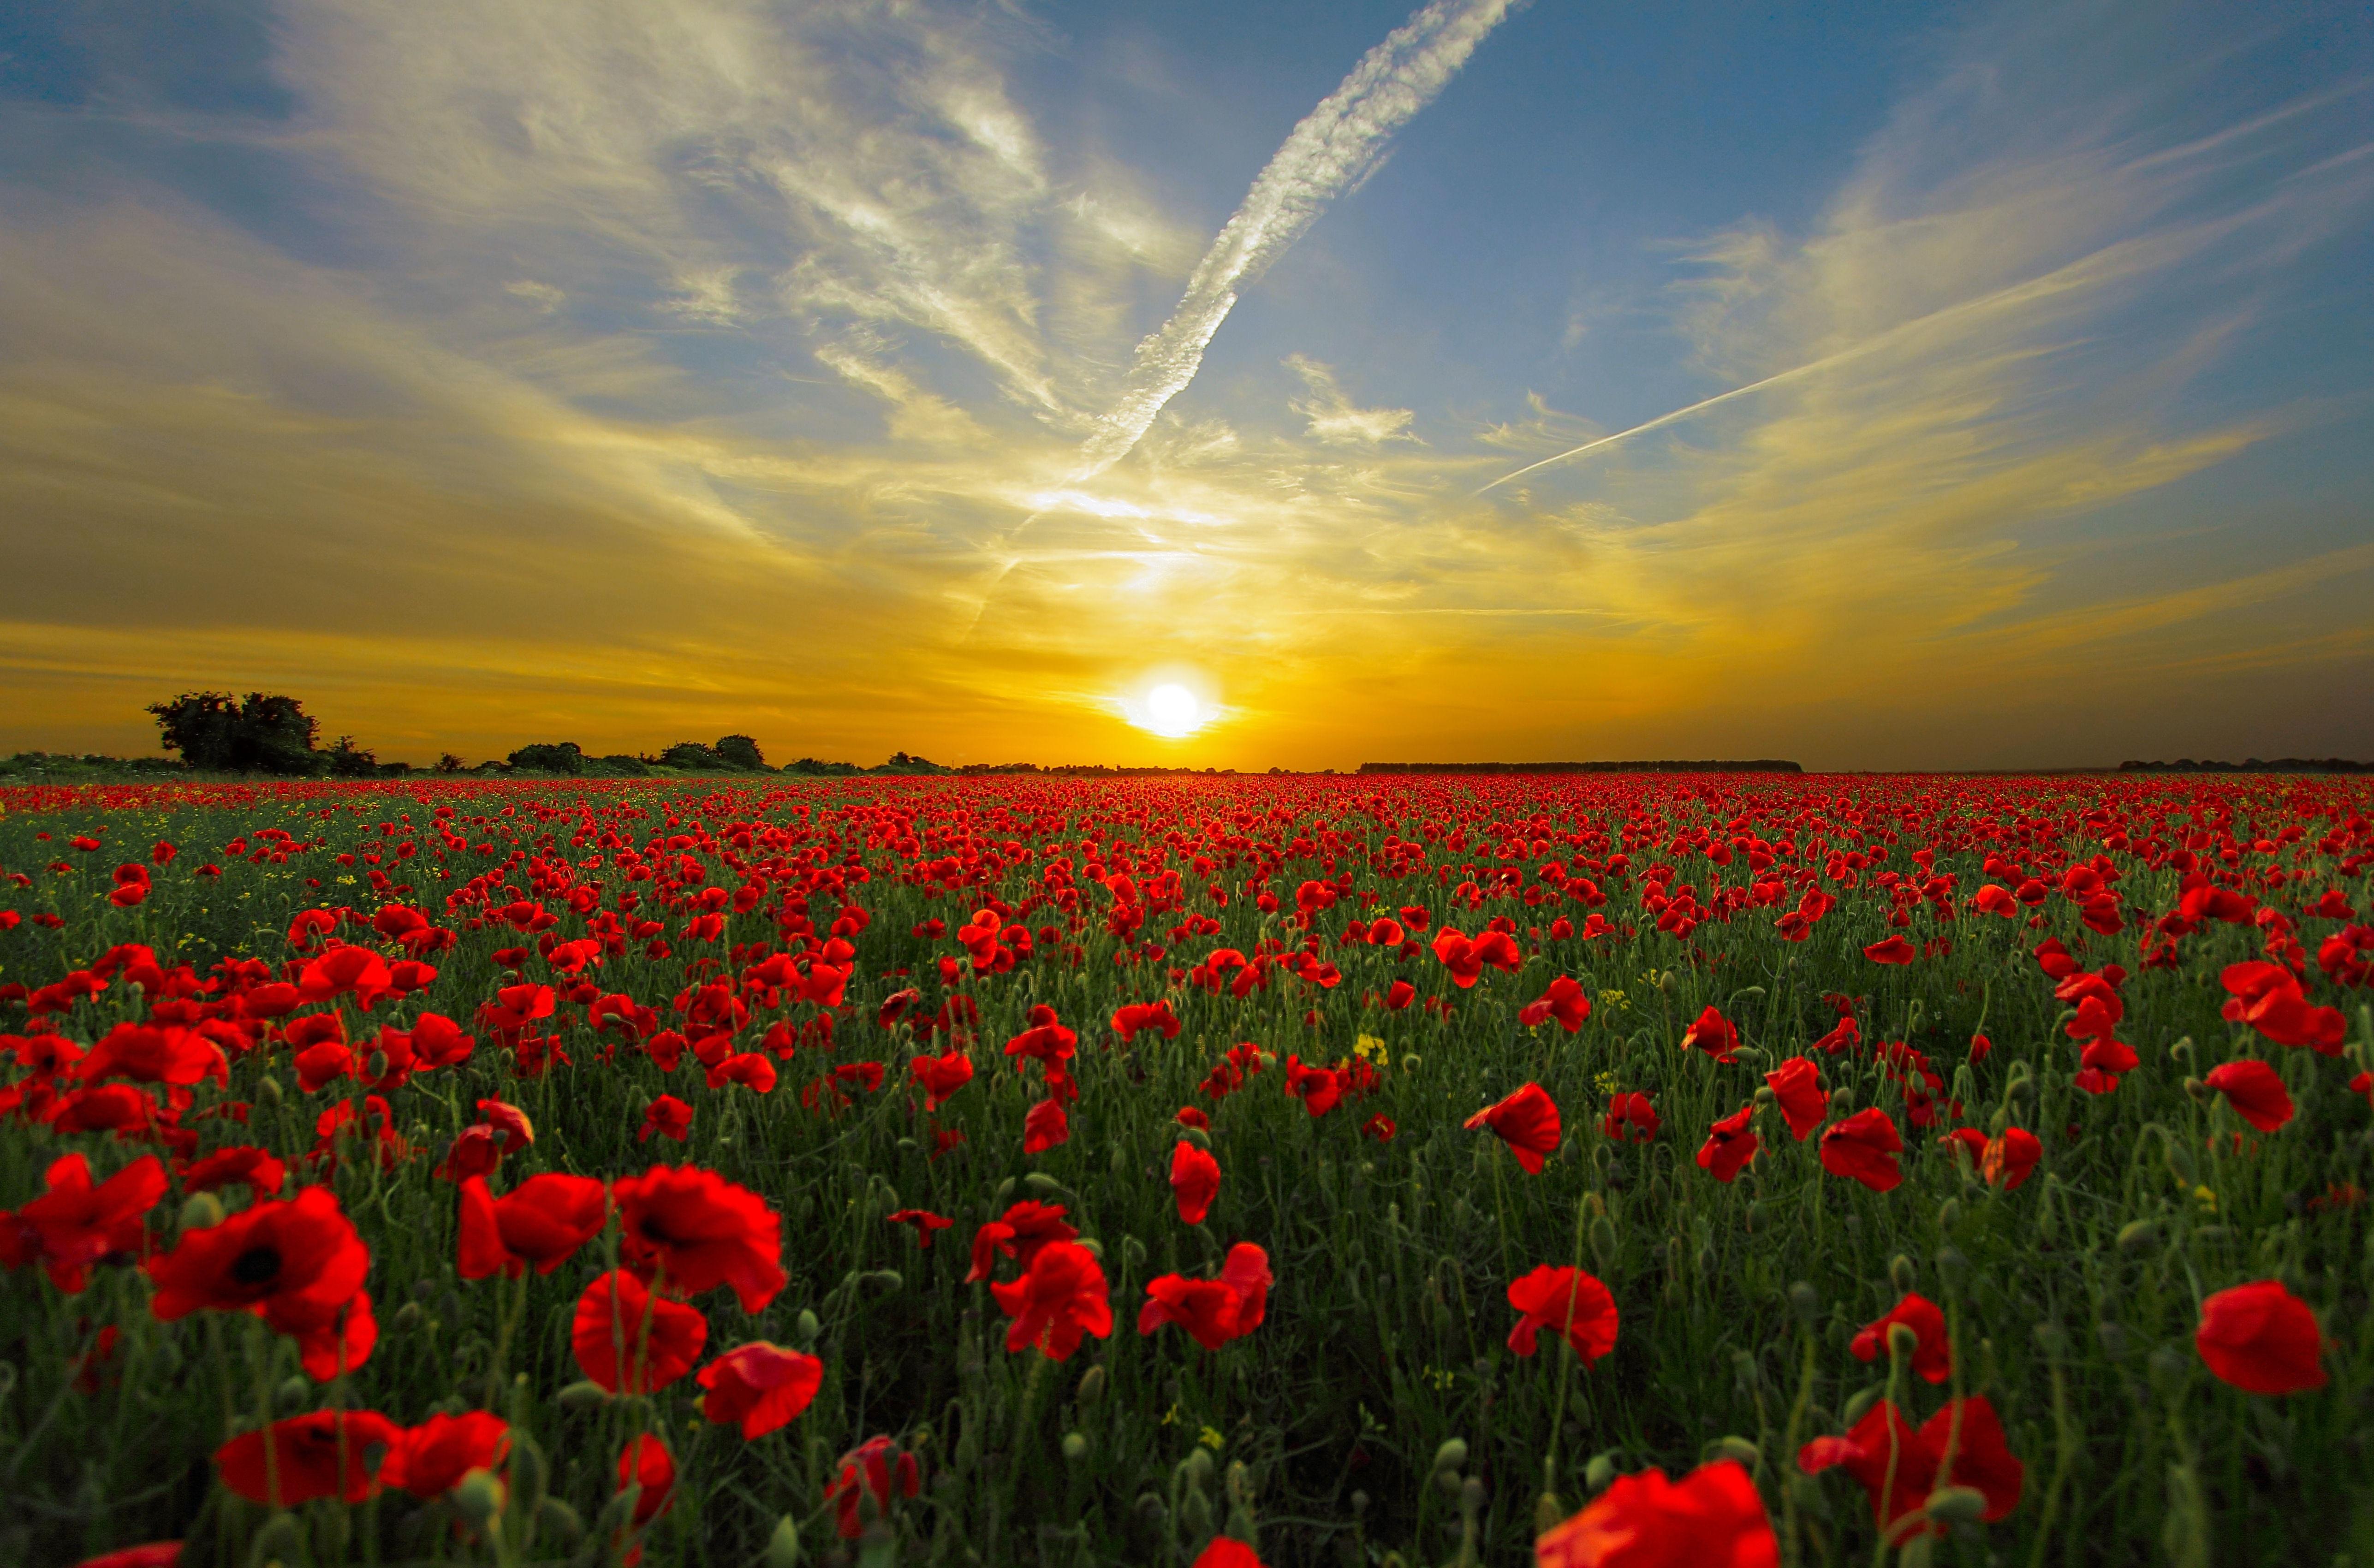 Landscape Nature Horizon Plant Sky Sun Sunrise Sunset Field Meadow Prairie Flower Red Plain Wildflower Clouds